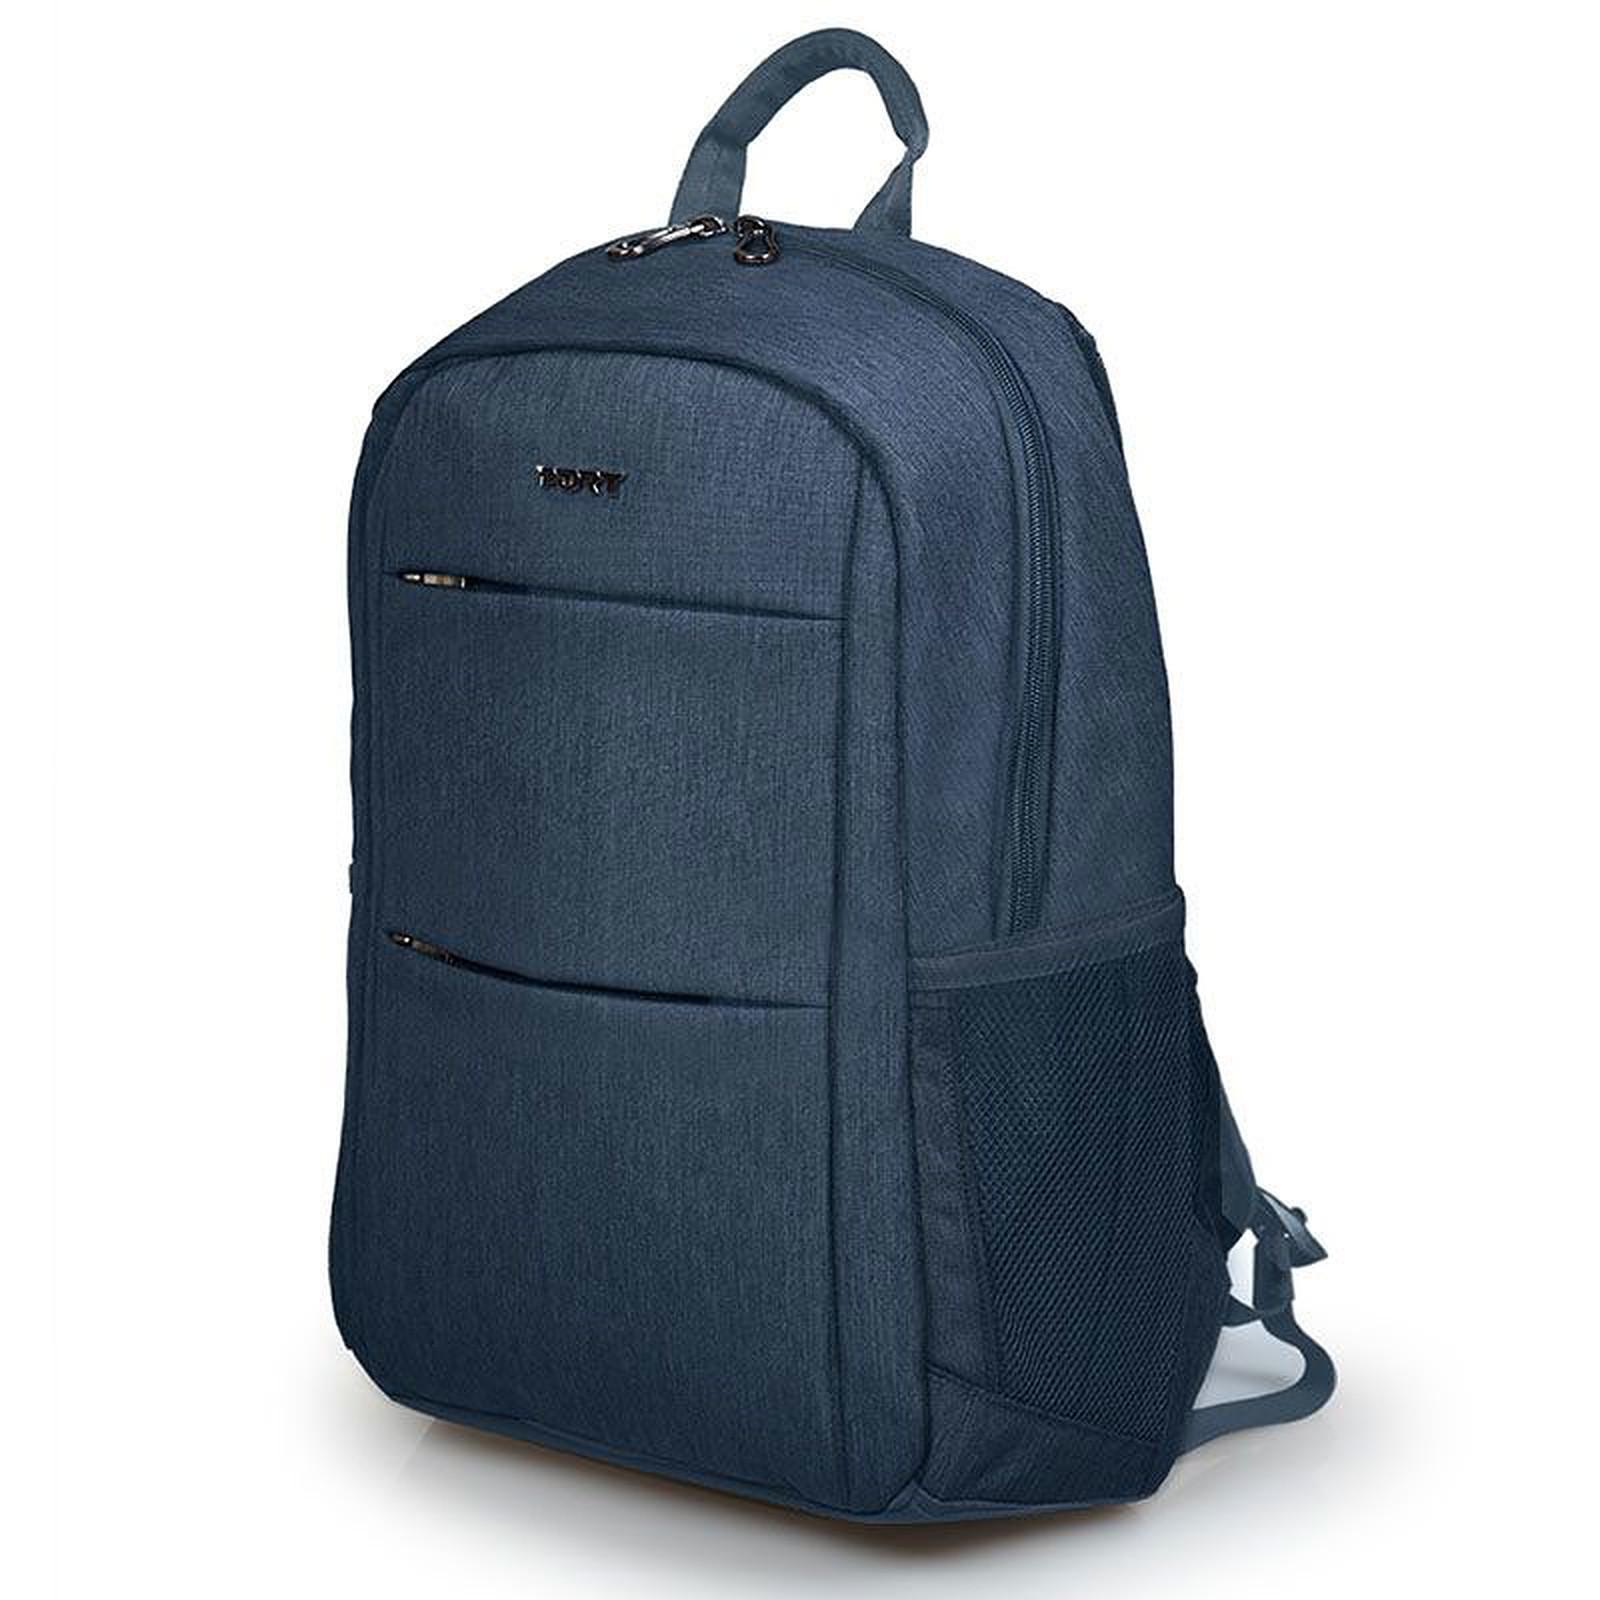 "PORT Designs Sydney Backpack 15.6"" (Azul)"